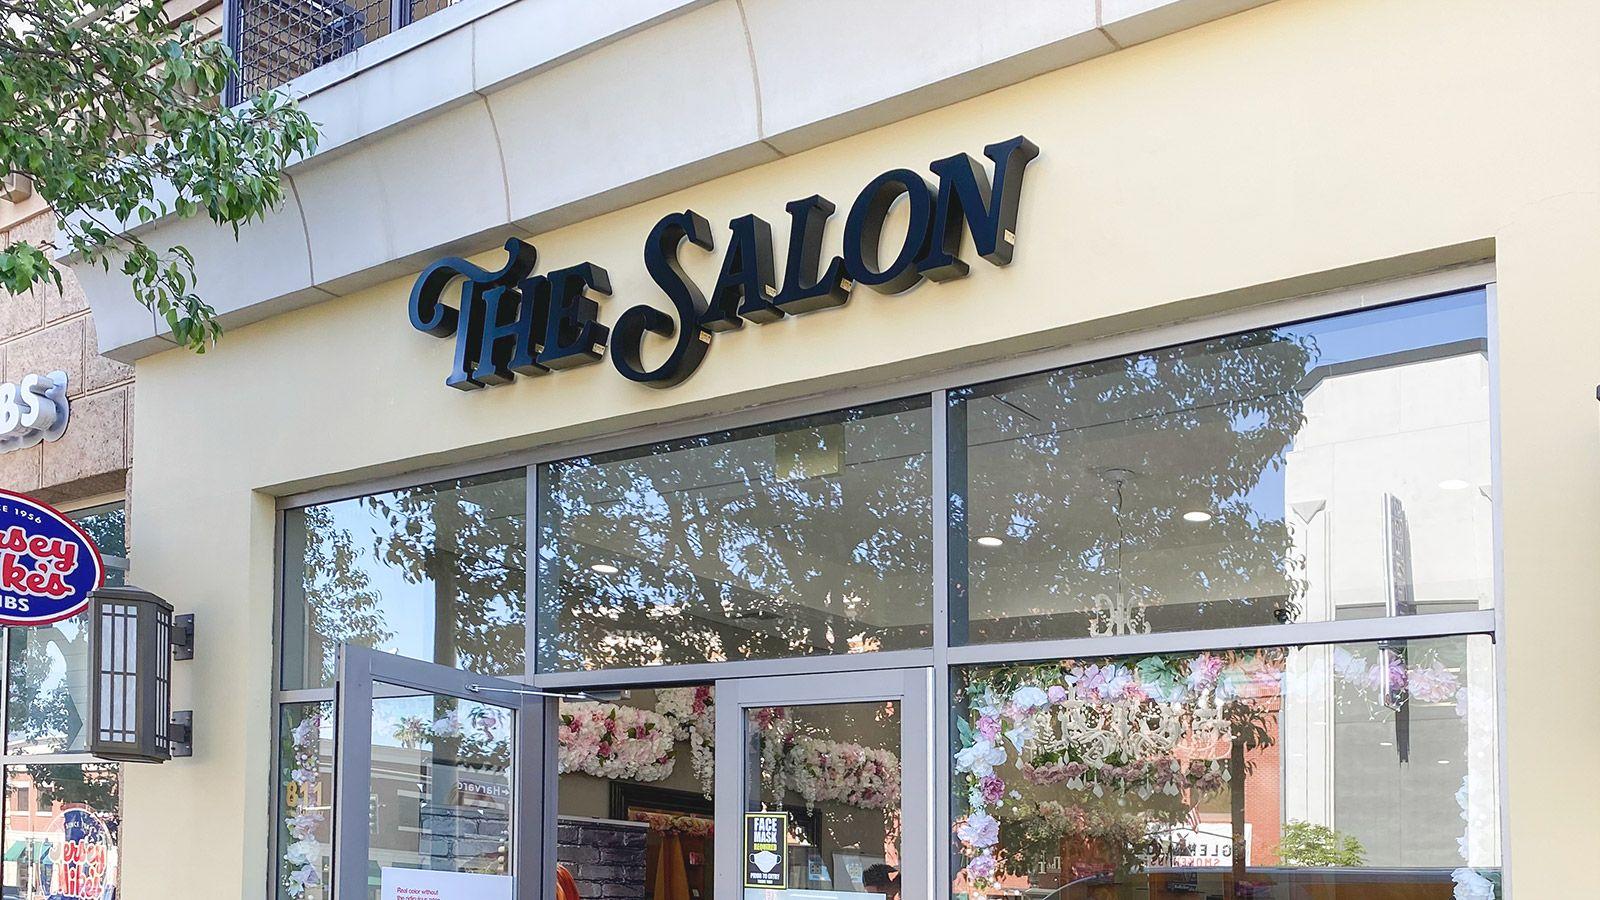 the salon storefront sign